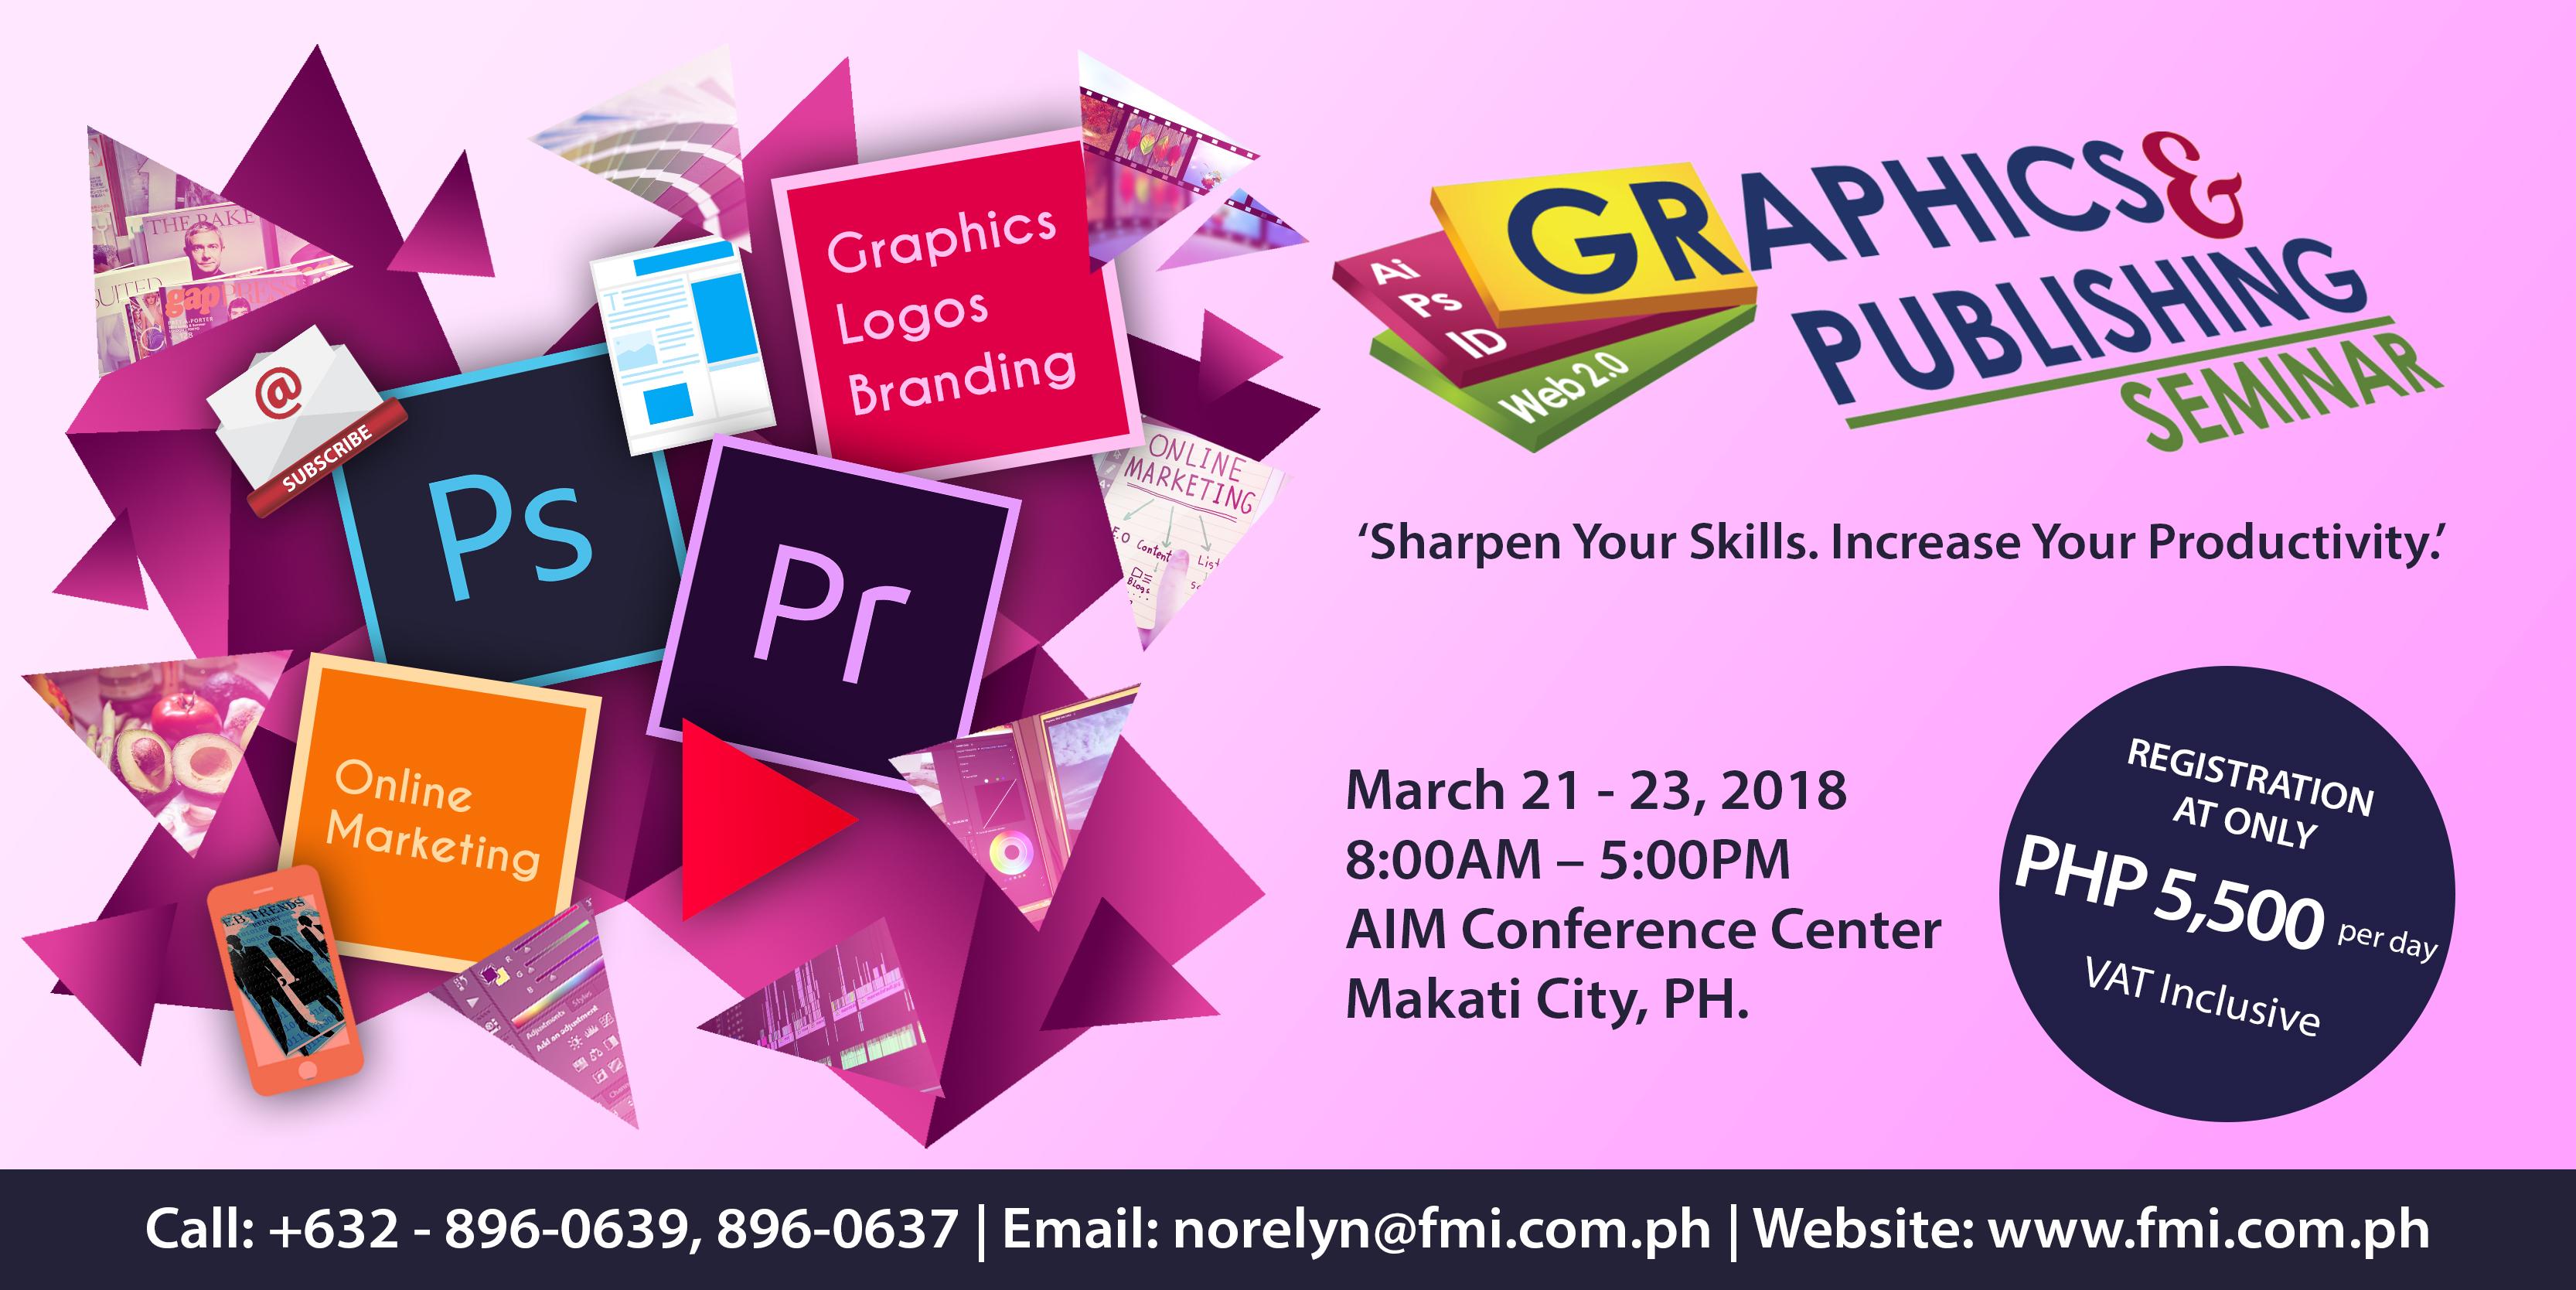 23rd Graphics & Publishing Seminar 2018